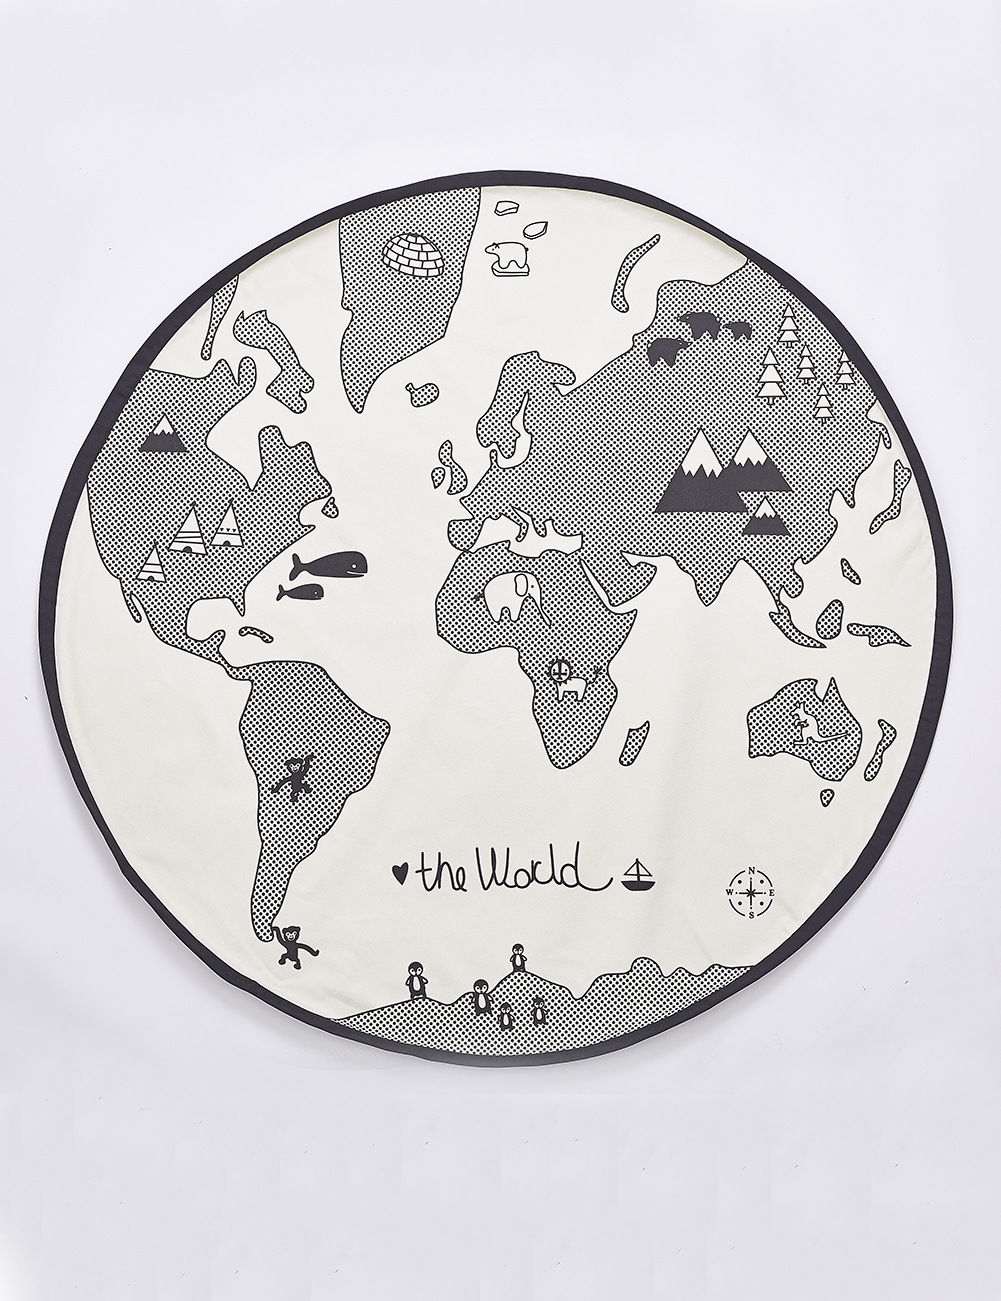 World Map Baby Play Mats Kids Crawling Carpet Floor Rug Baby Bedding Rabbit Blanket Cotton Game